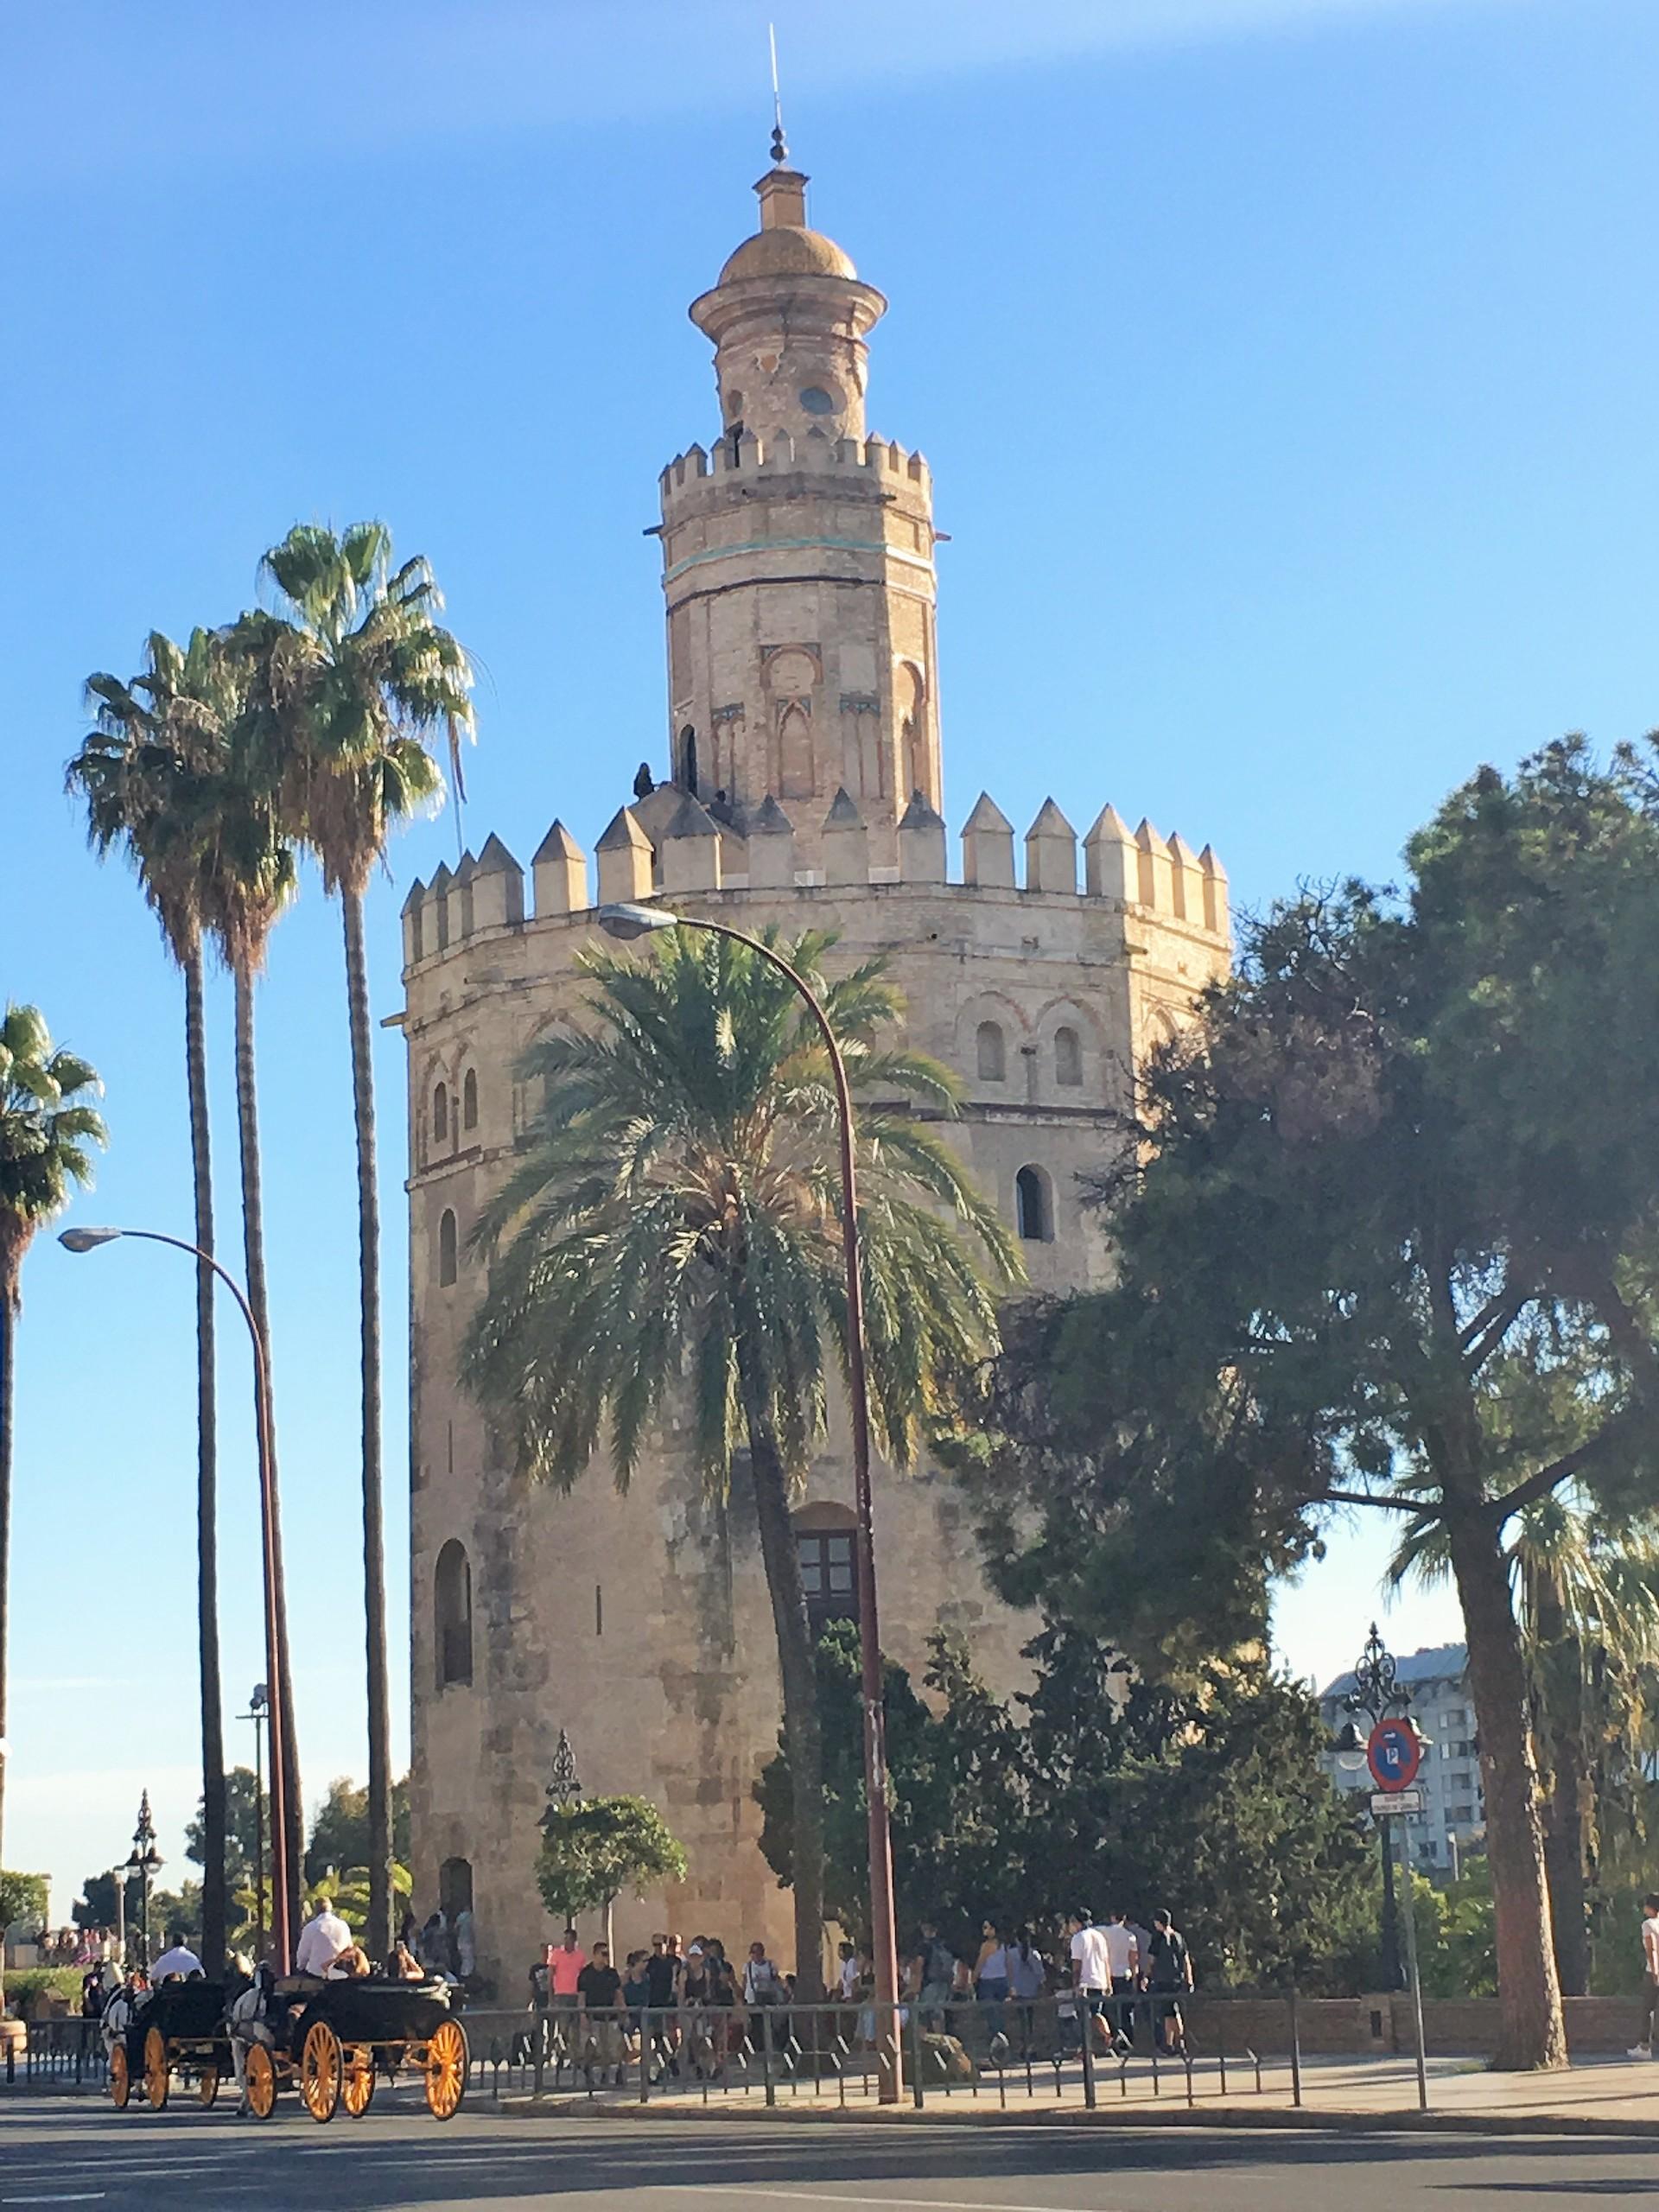 sevilla-capital-andalusia-4bcc1183948a75